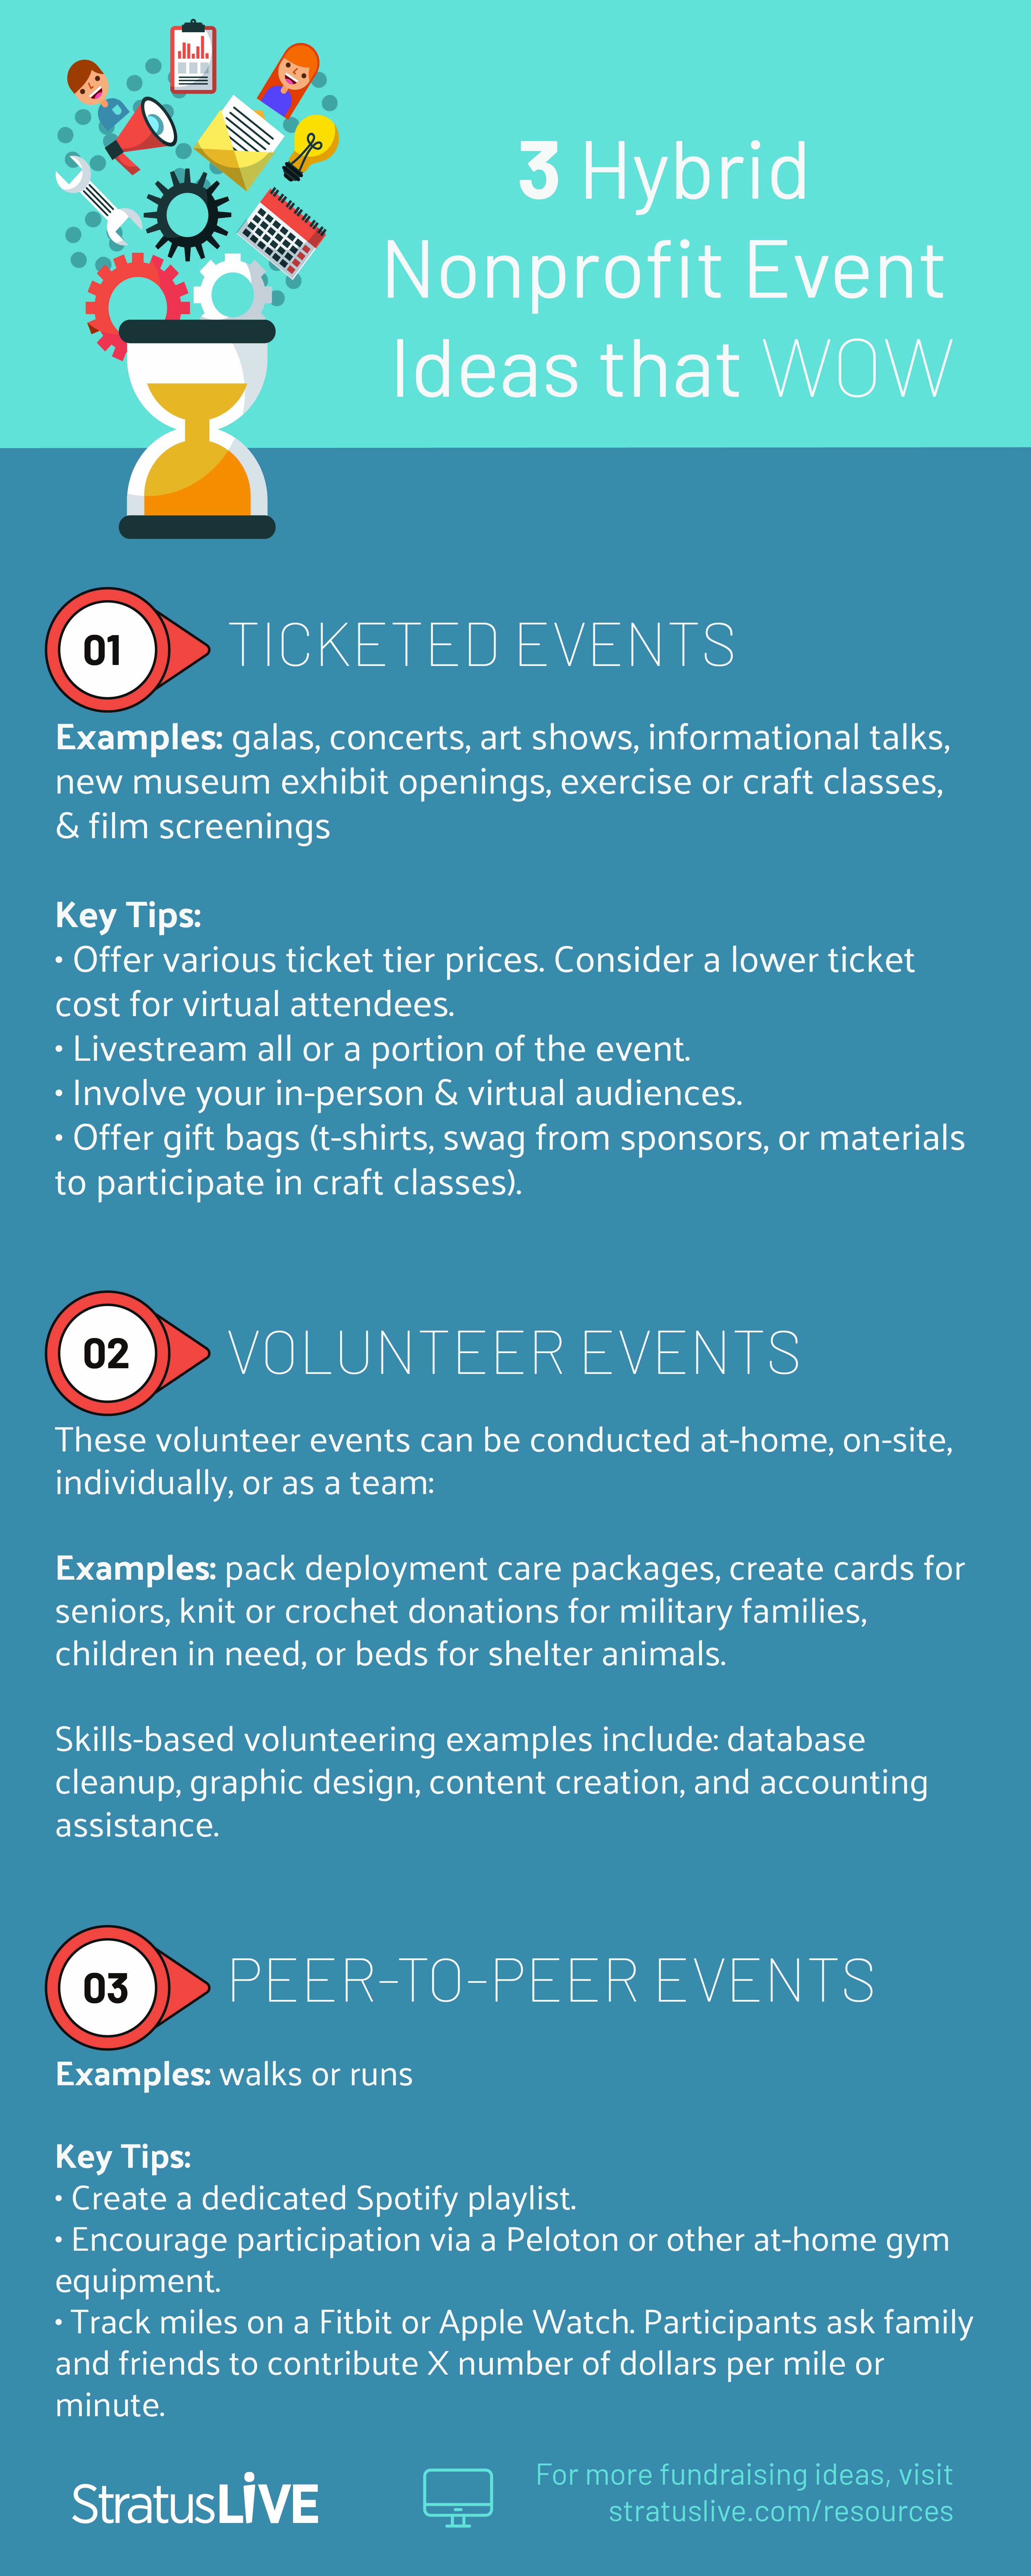 Three_Nonprofit_Hybrid_Event_Ideas_that_Wow.Infographic